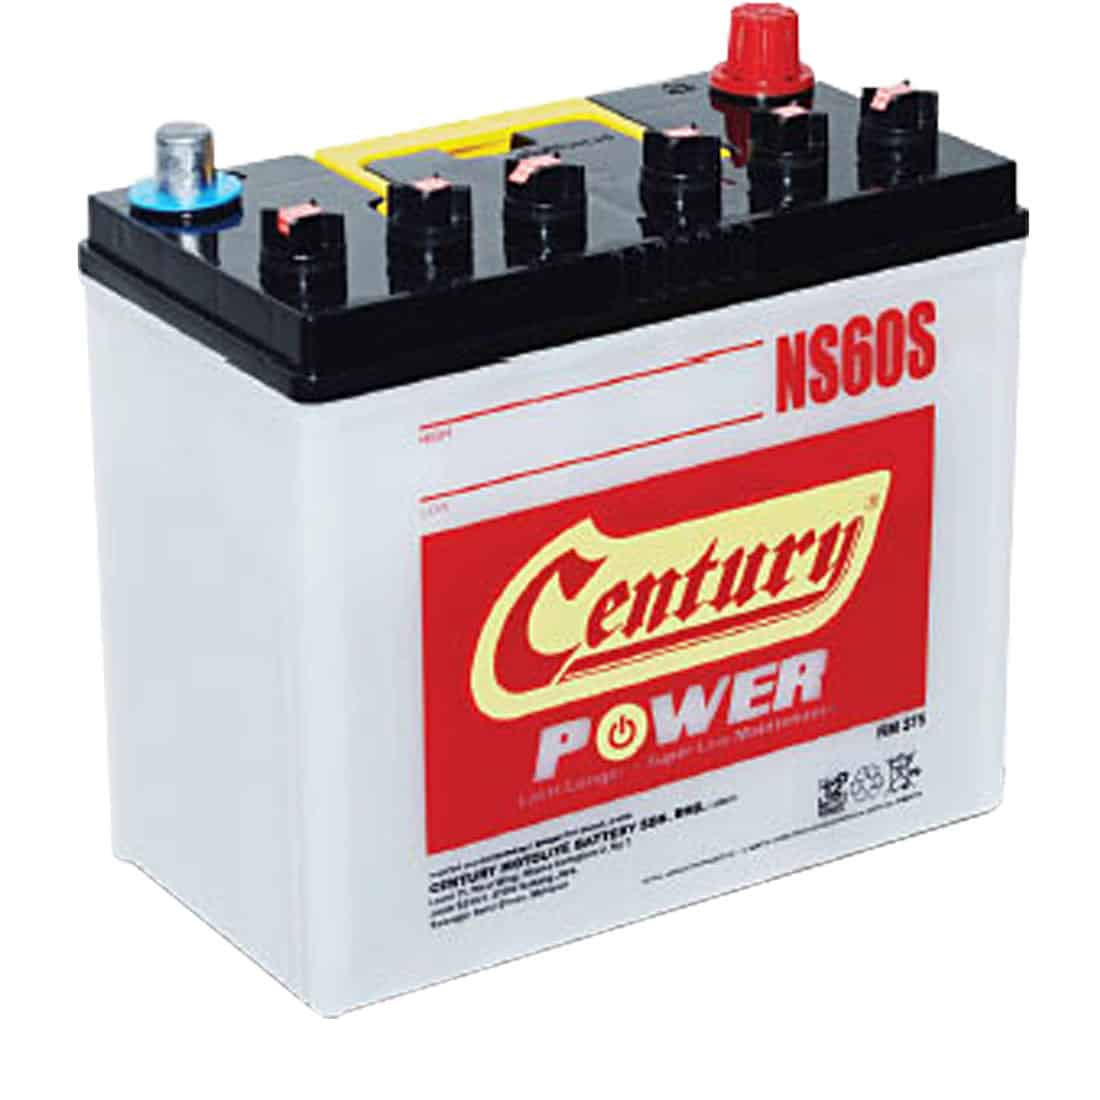 Century Power Battery